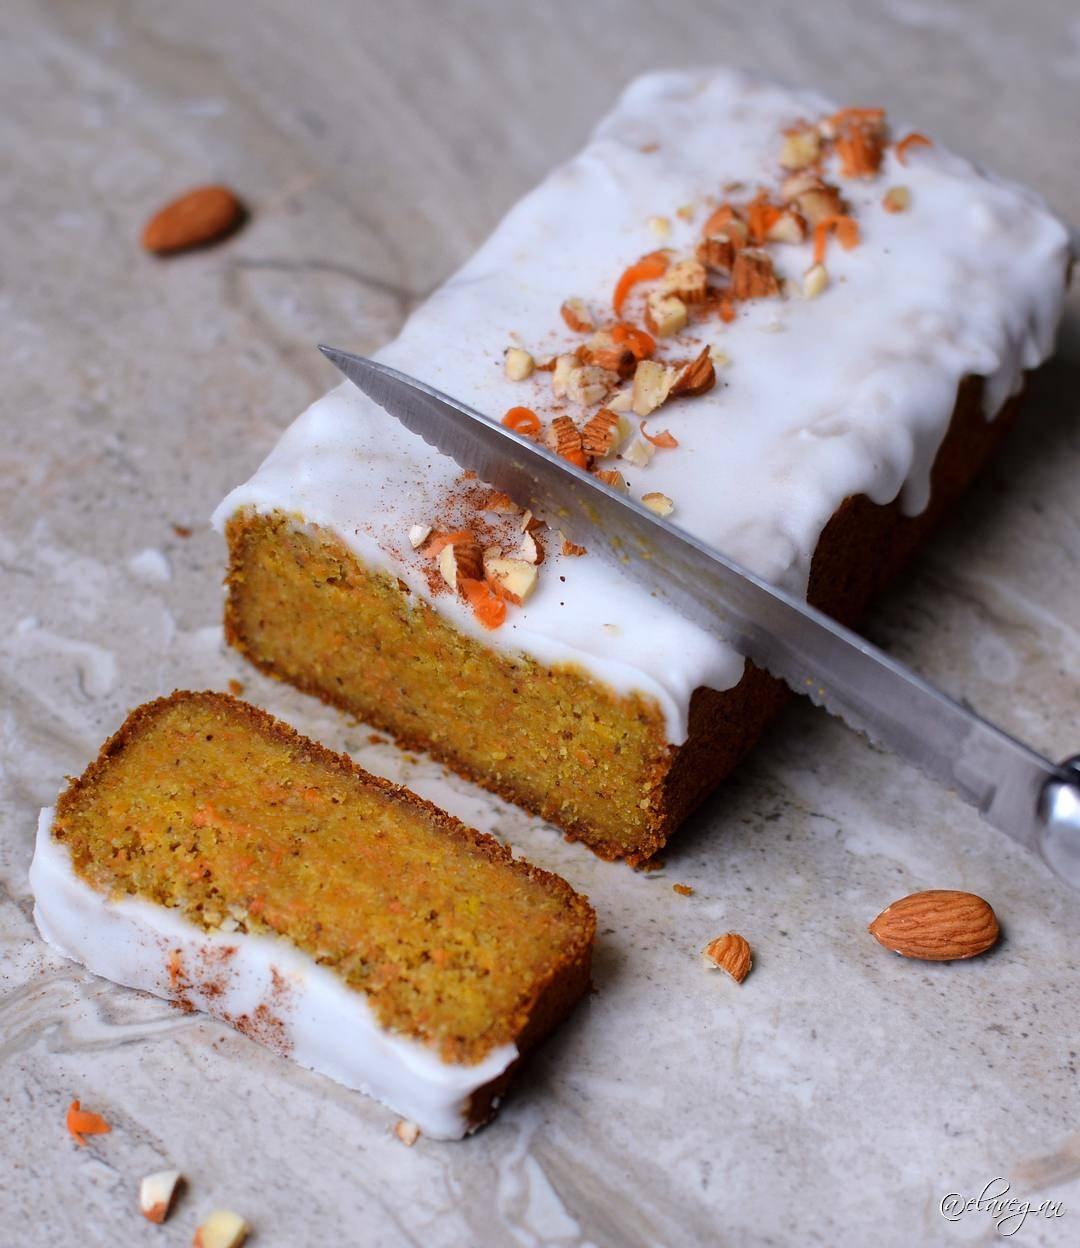 Gluten Free Dairy Free Vegan Recipes  Vegan gluten free carrot cake recipe